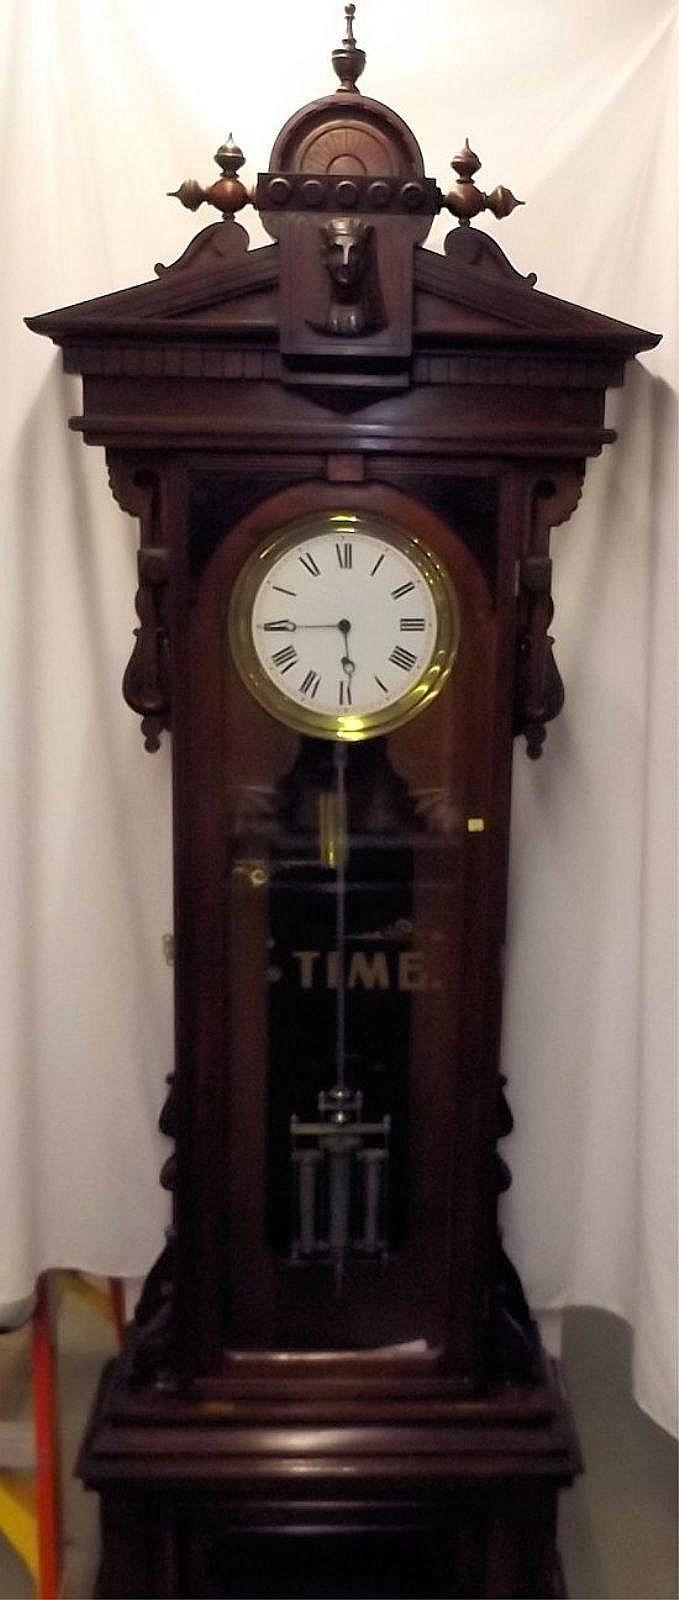 American Standing No 16 Regulator By Gilbert Antique Clocks Grandfather Clock Old Clocks